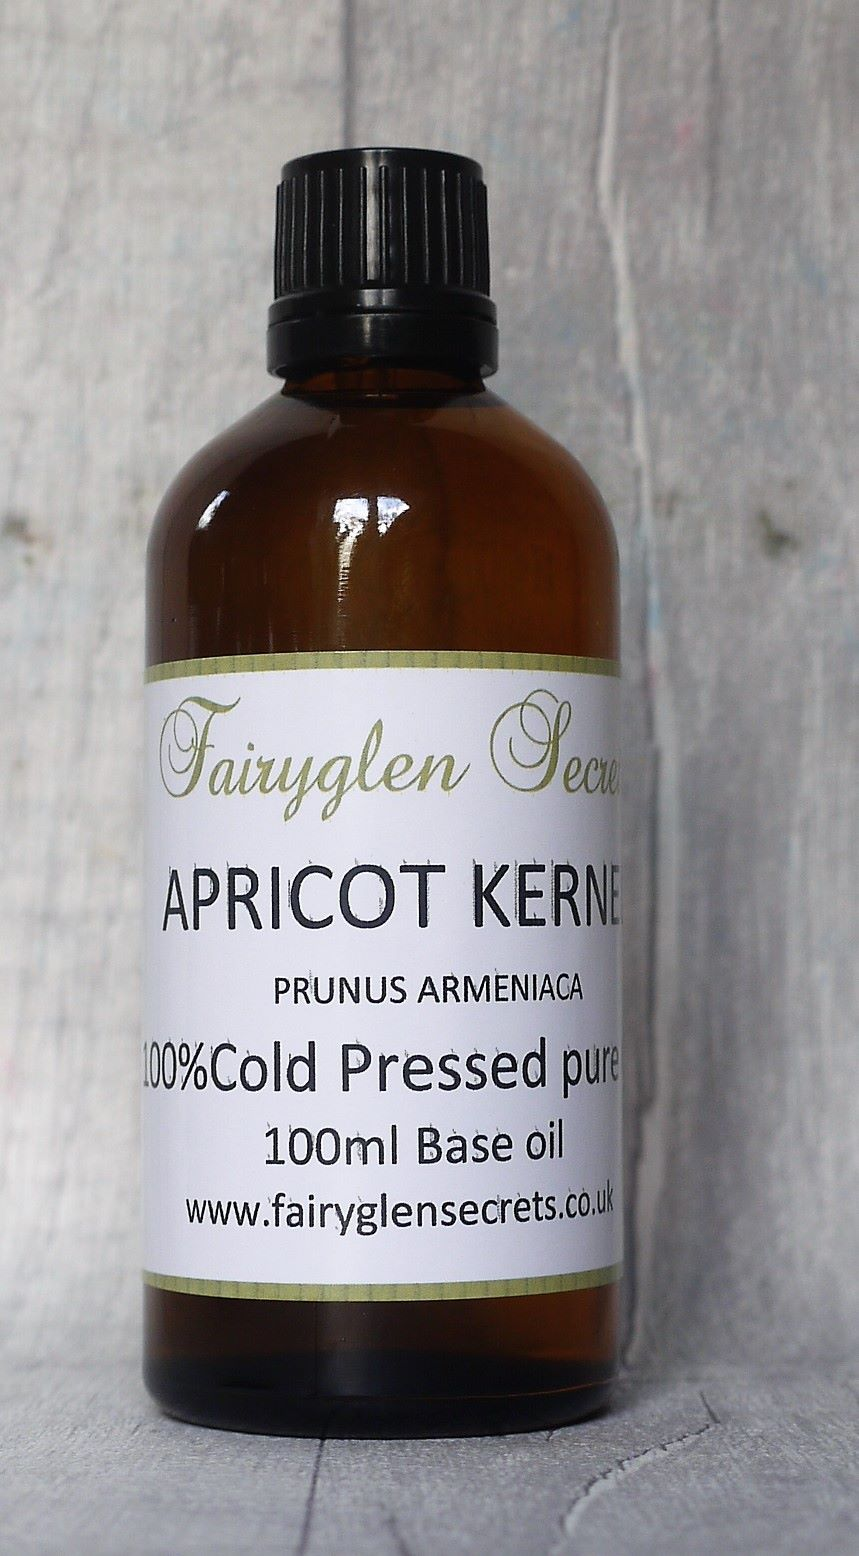 Apricot Kurnel base oil